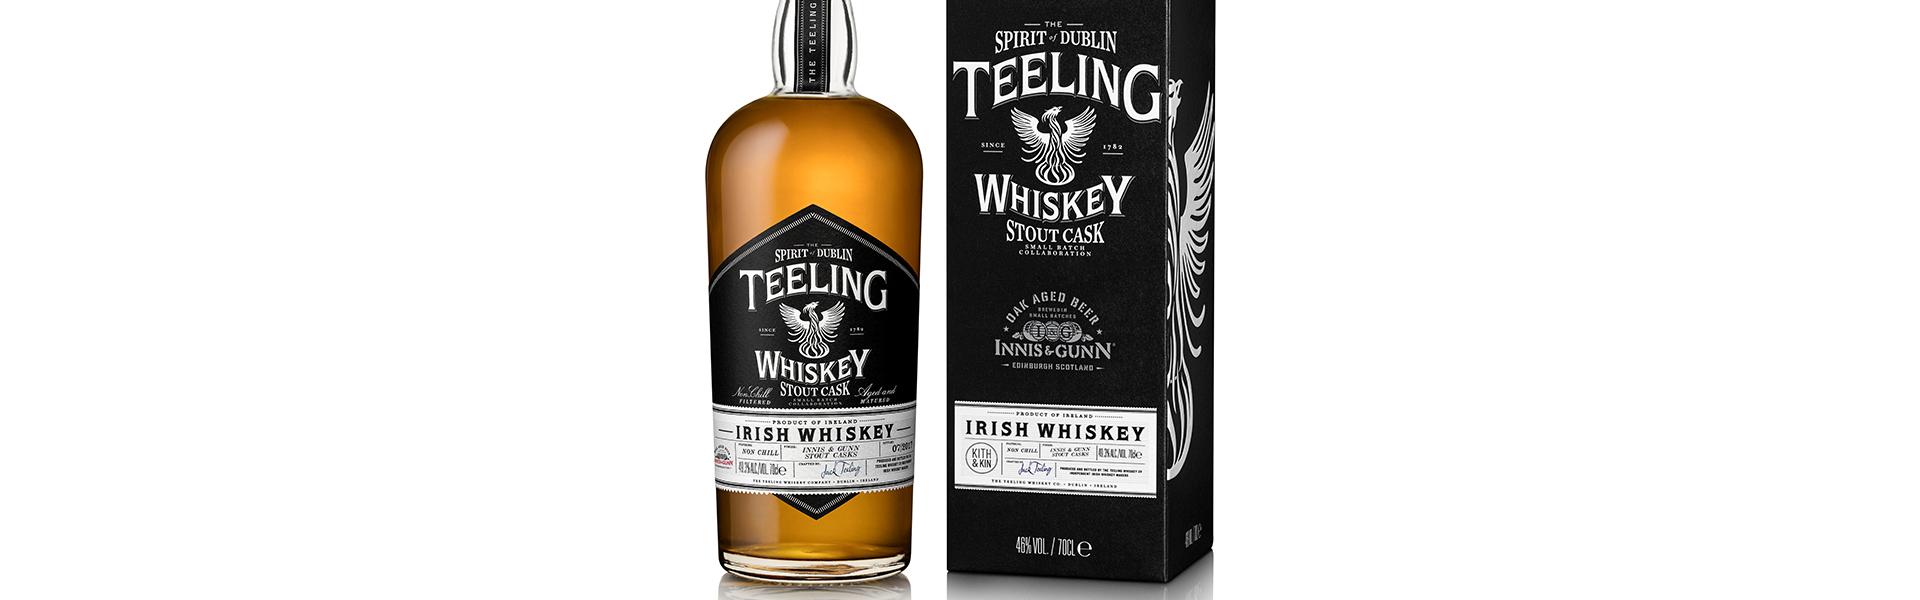 Teeling släpper Innis & Gunn-lagrad whiskey exklusivt på Systembolaget 6 oktober.